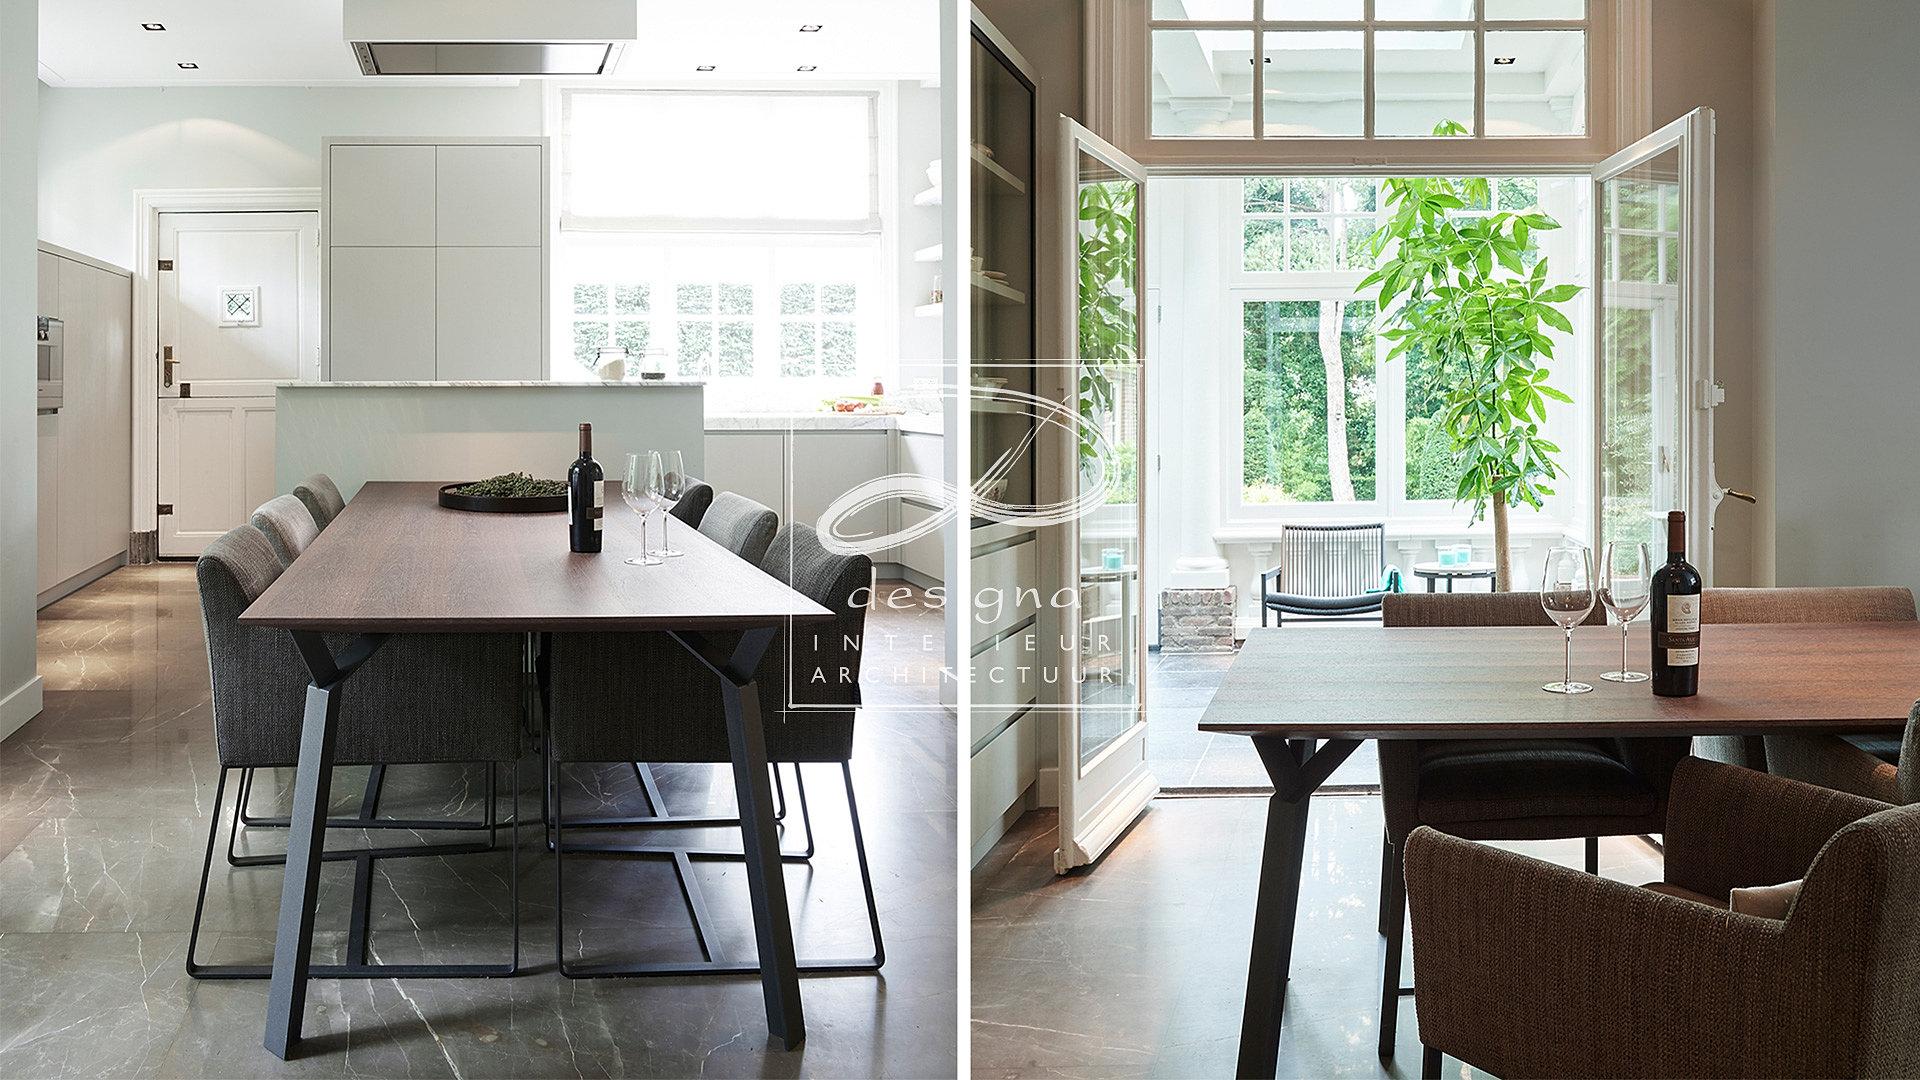 #669B3022350048  Architectenbureau Designa Laren Interieurontwerp Villa Hilversum Meest effectief Designa Interieur Laren 3095 behang 192010803095 afbeeldingen